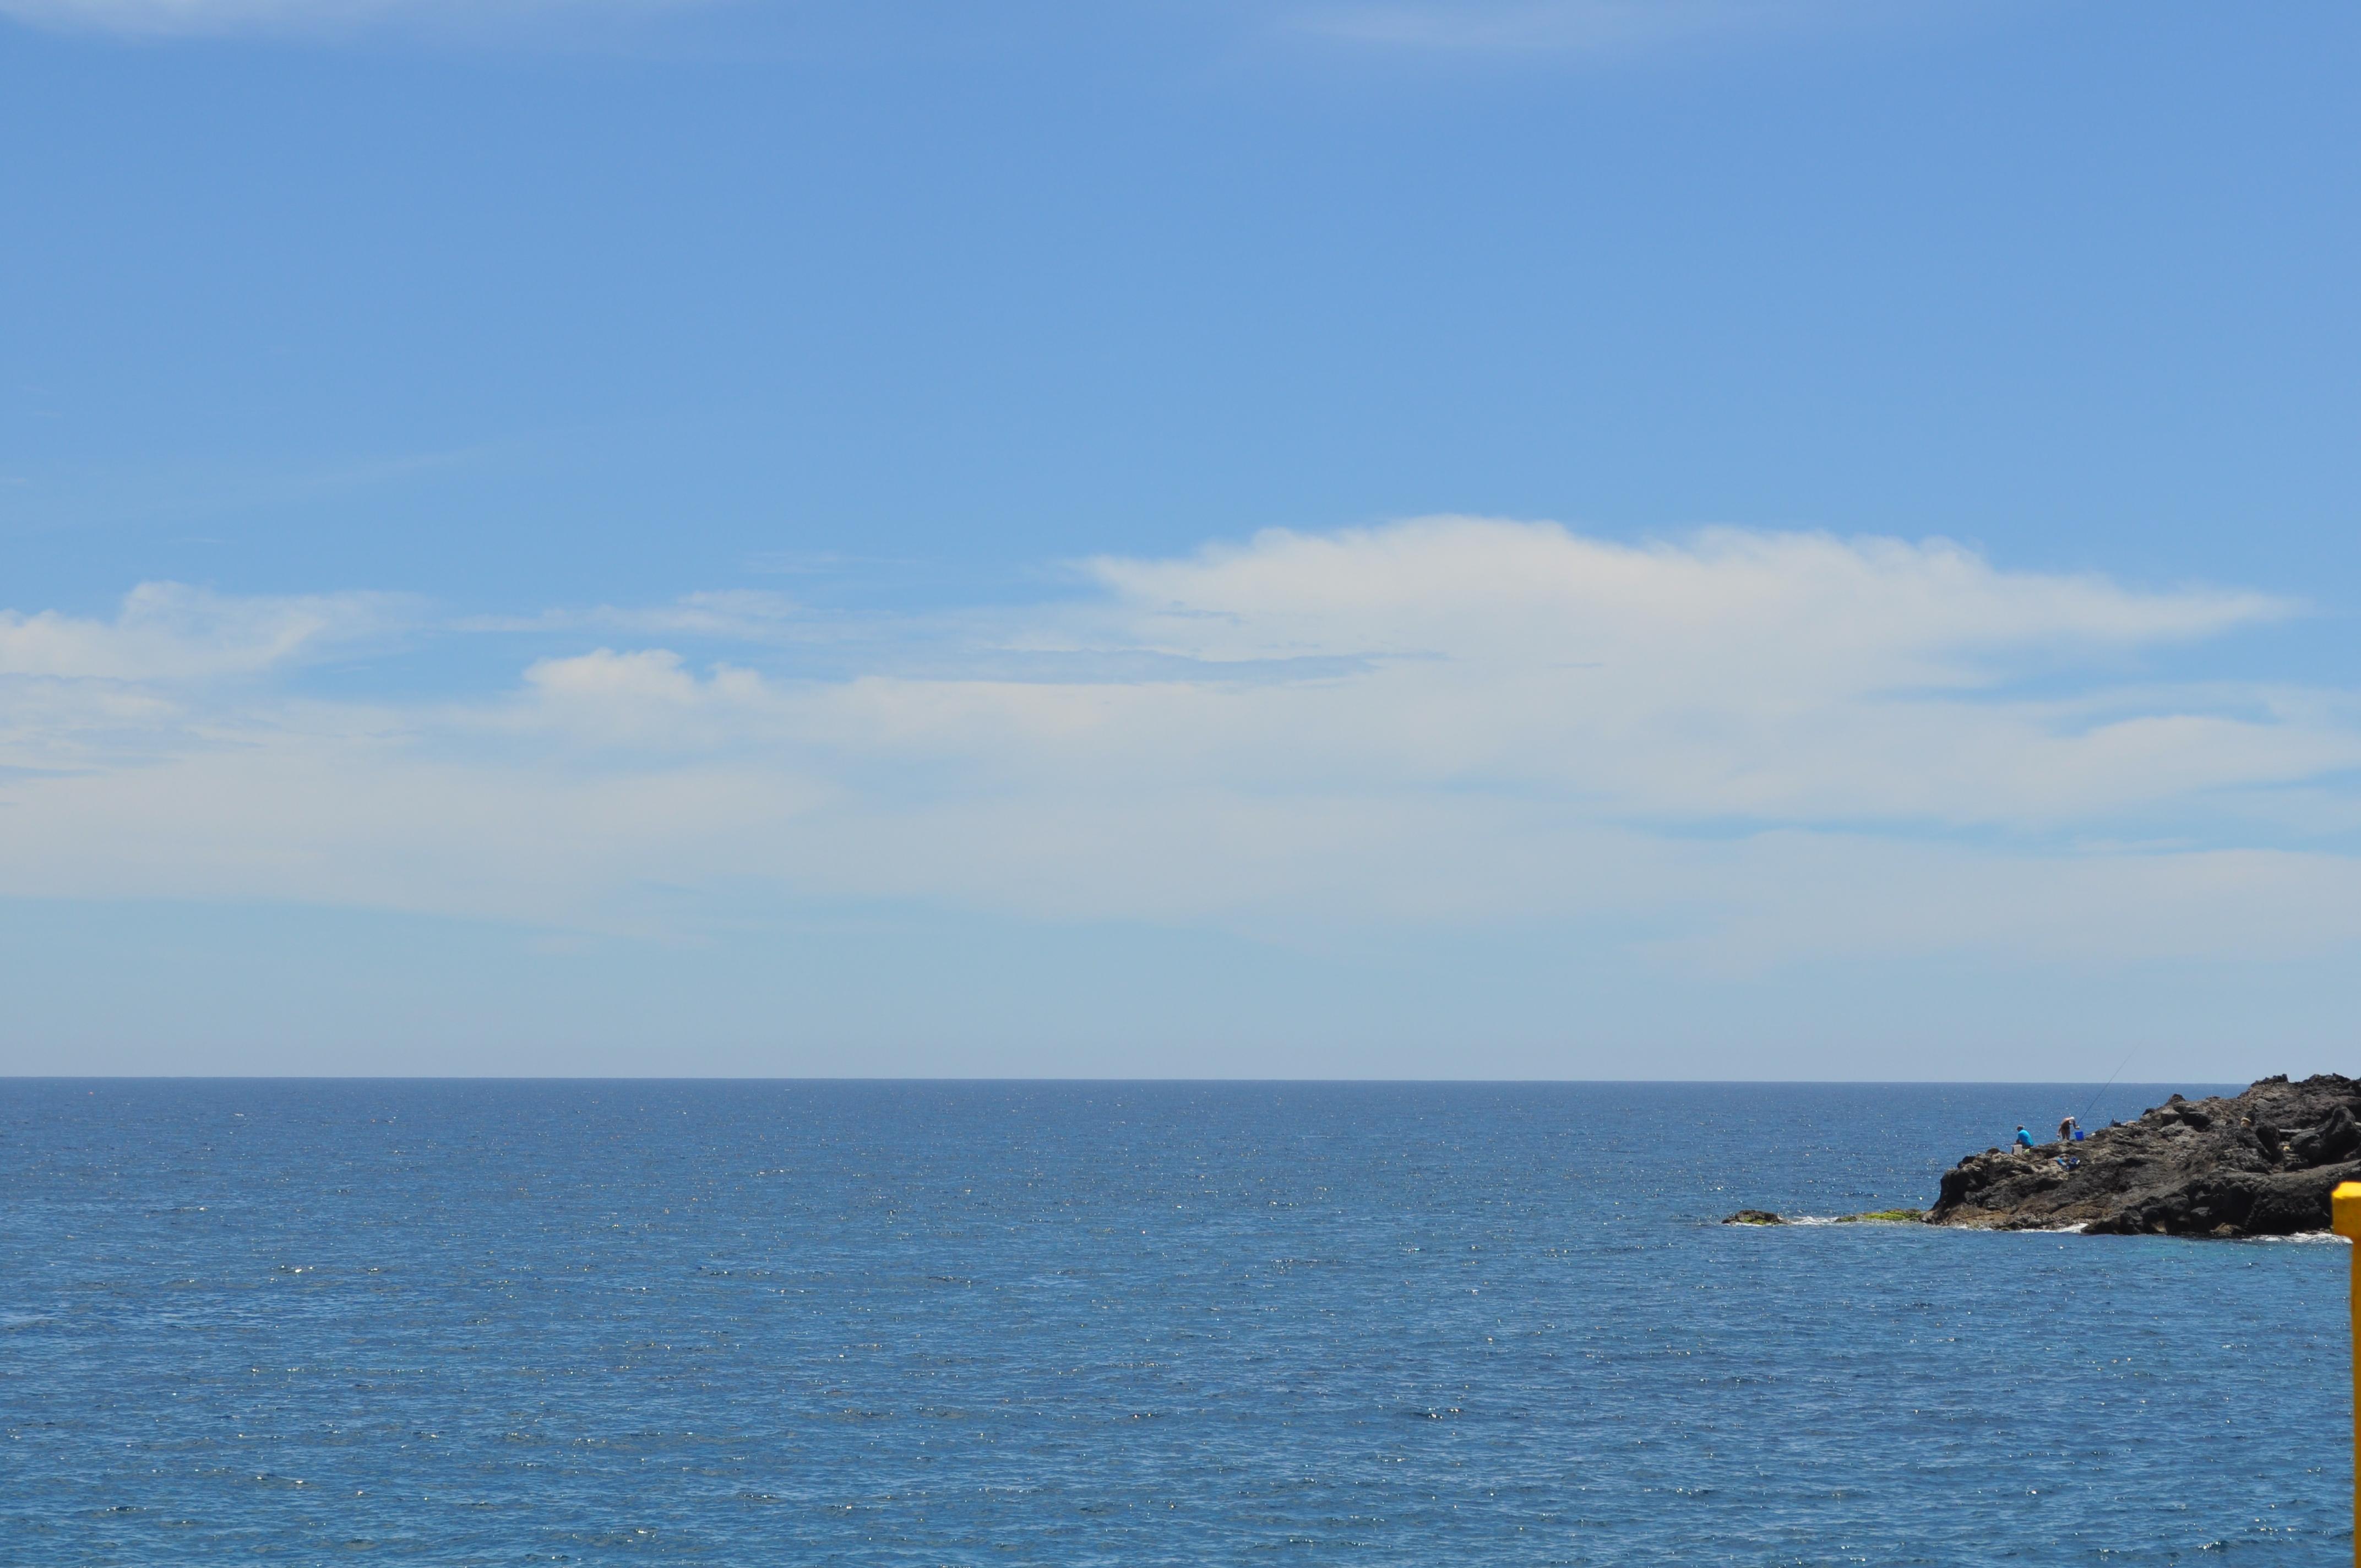 Que suerte vivir en Tenerife.